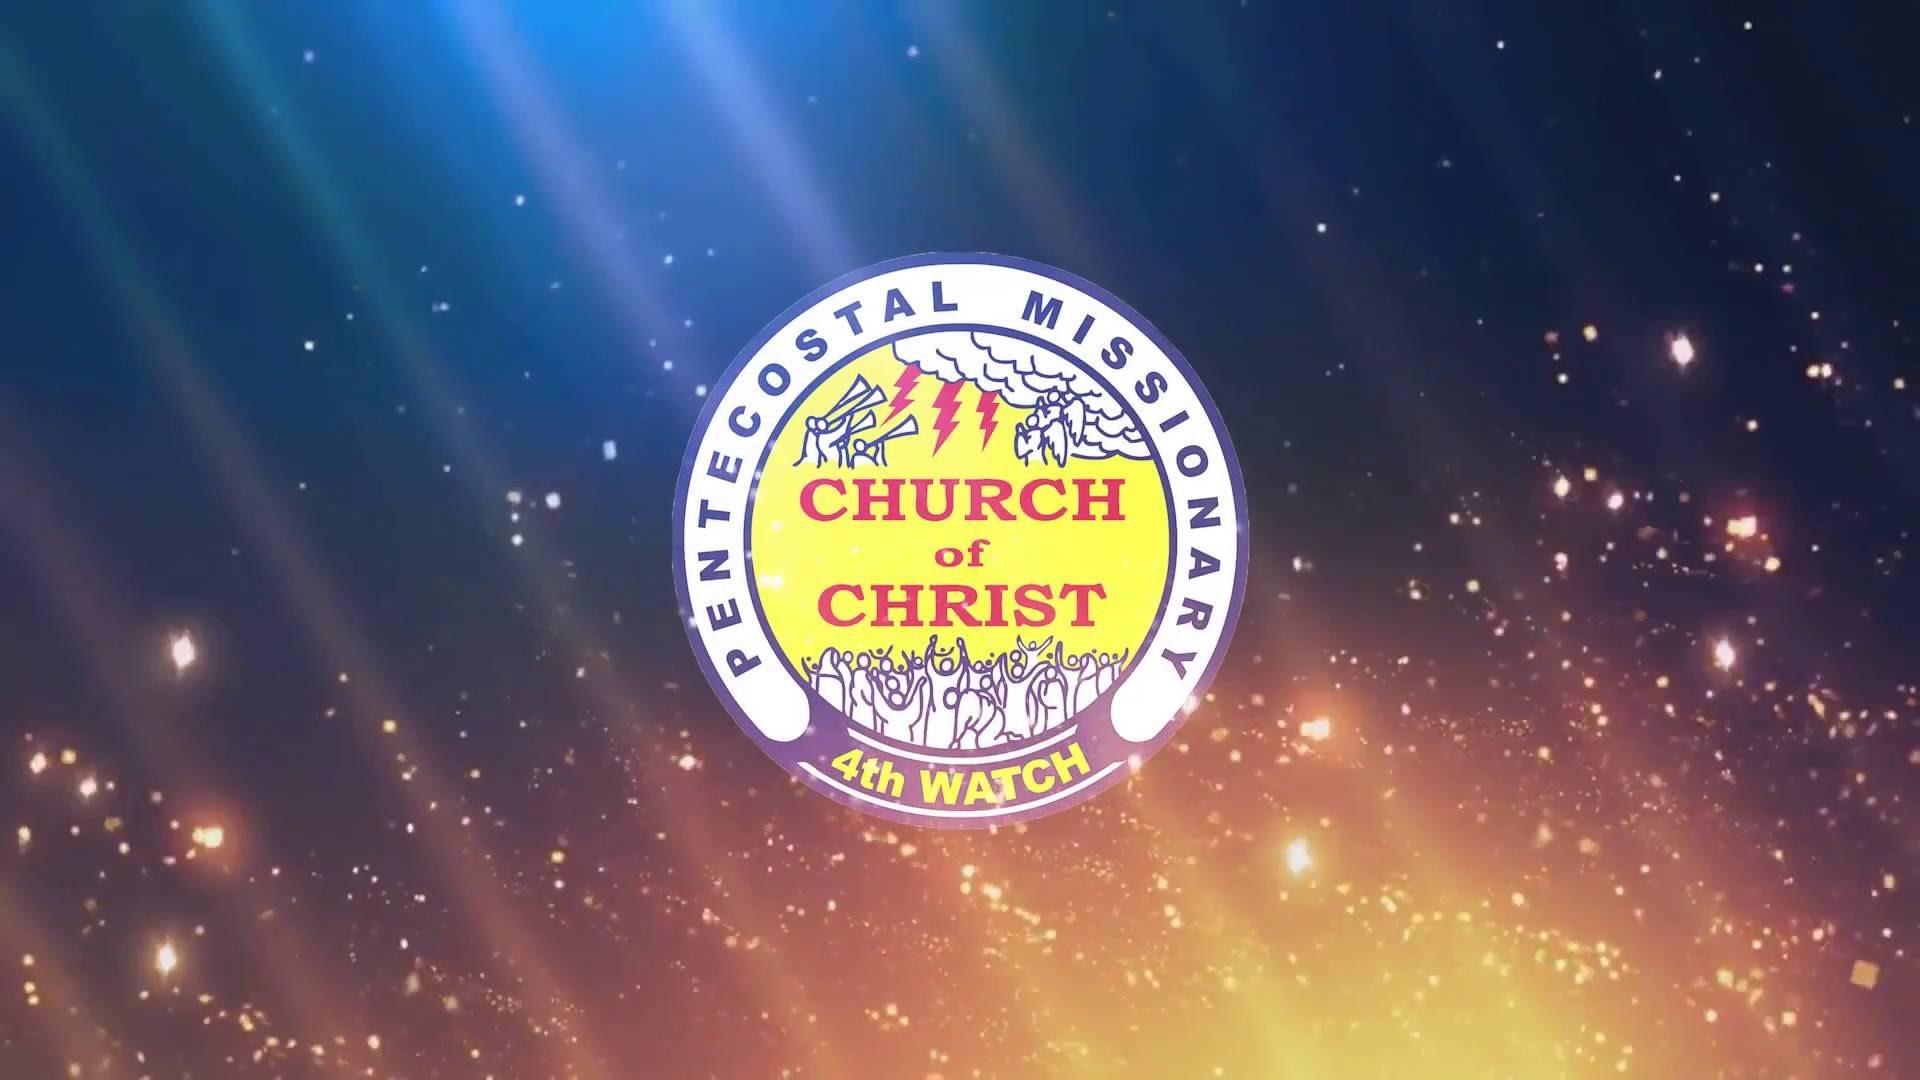 PMCC (4th Watch) of South Bay – 27th Church Anniversary Invite